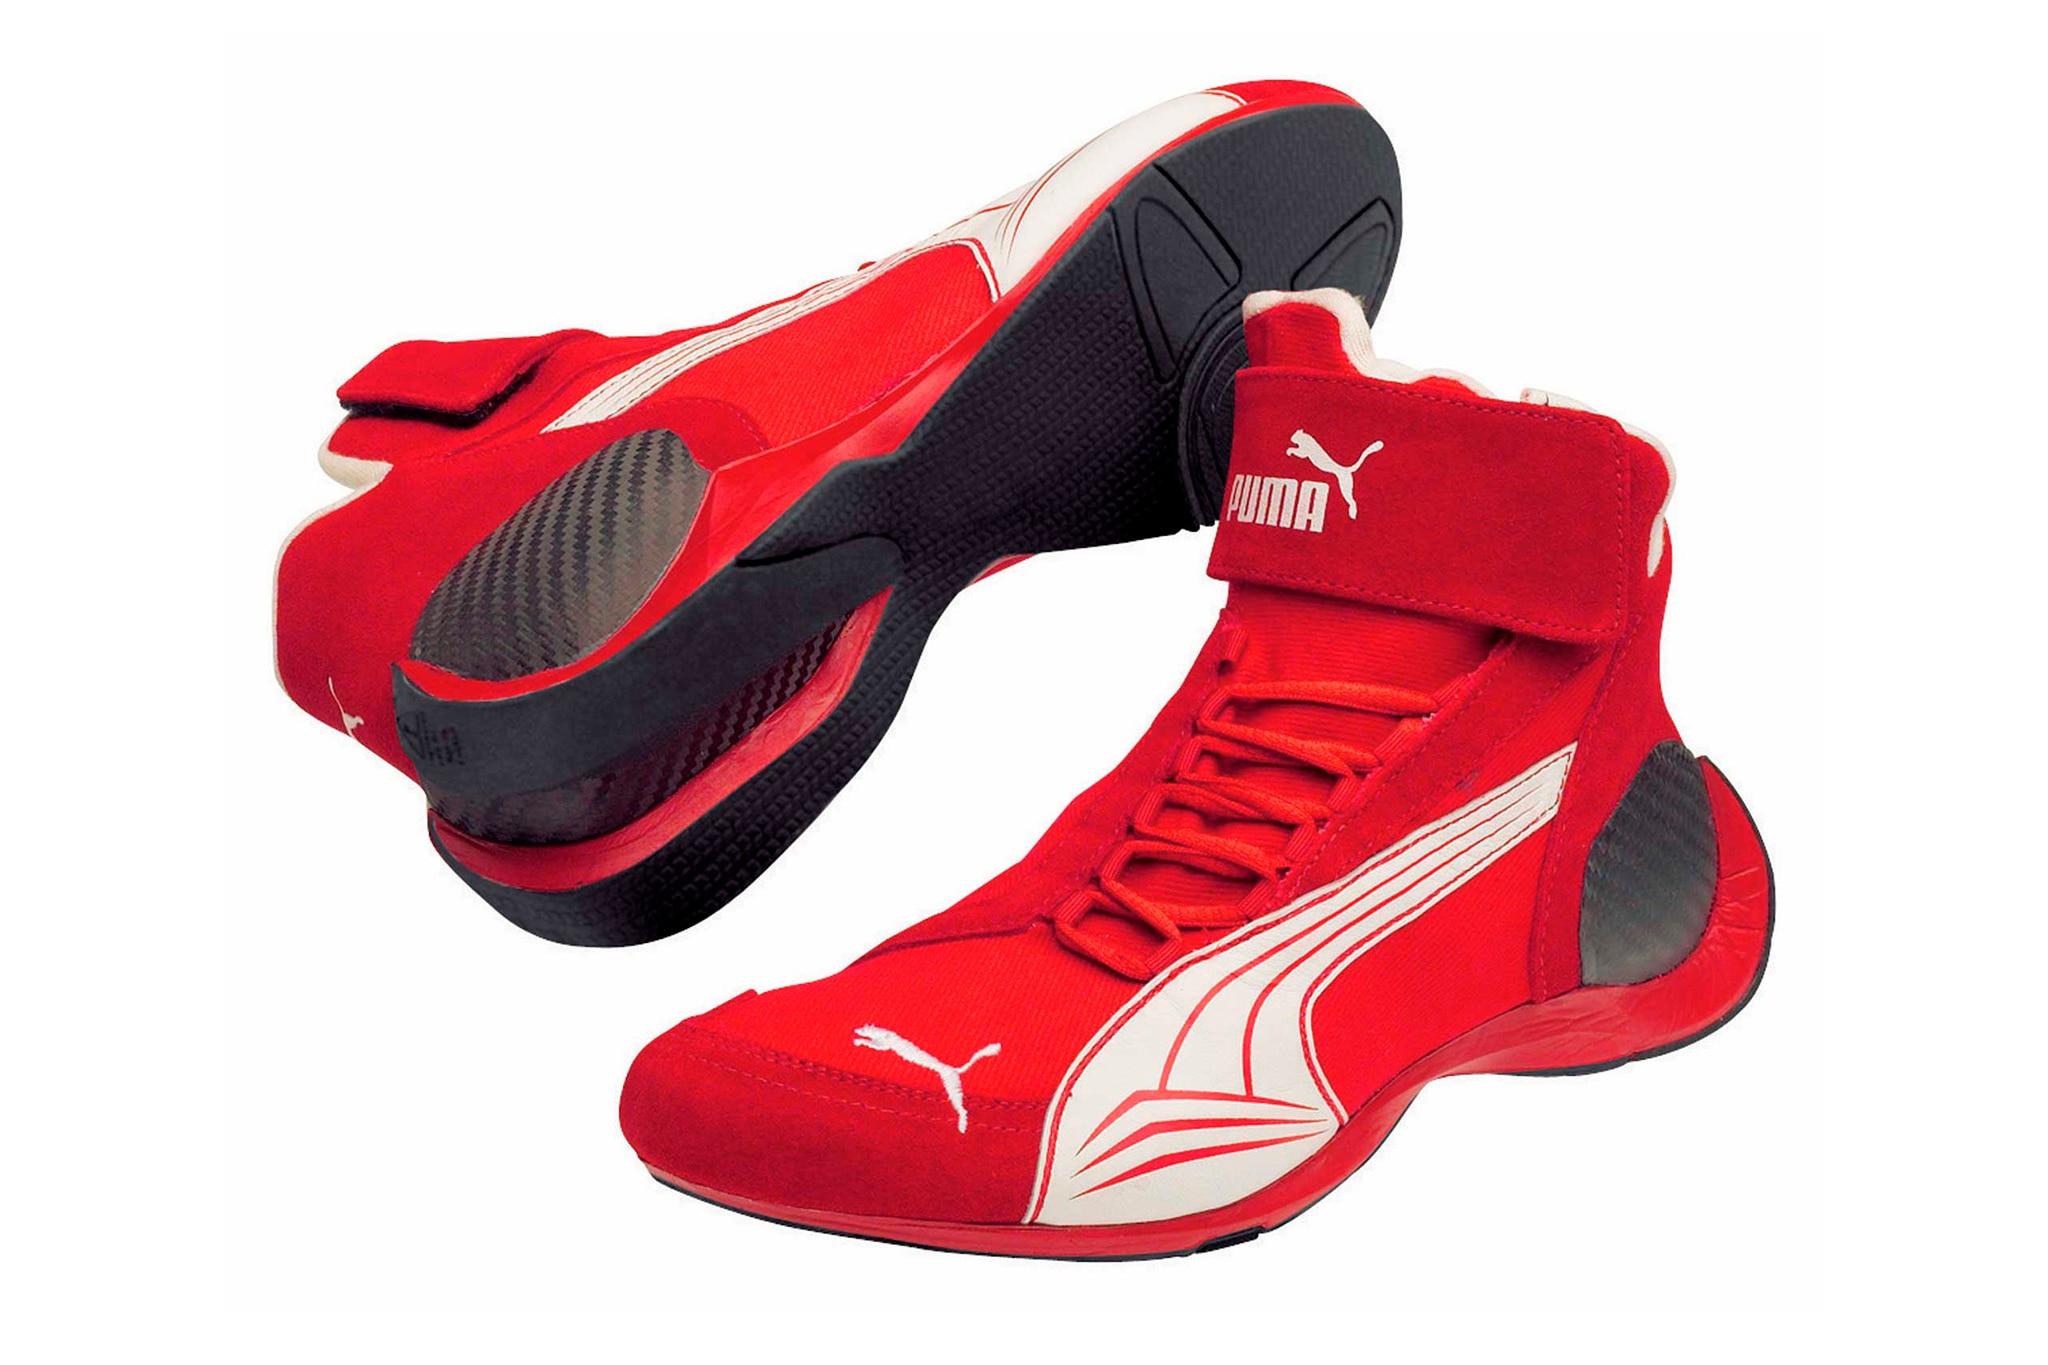 Buy > puma racing shoes high top Limit discounts 63% OFF